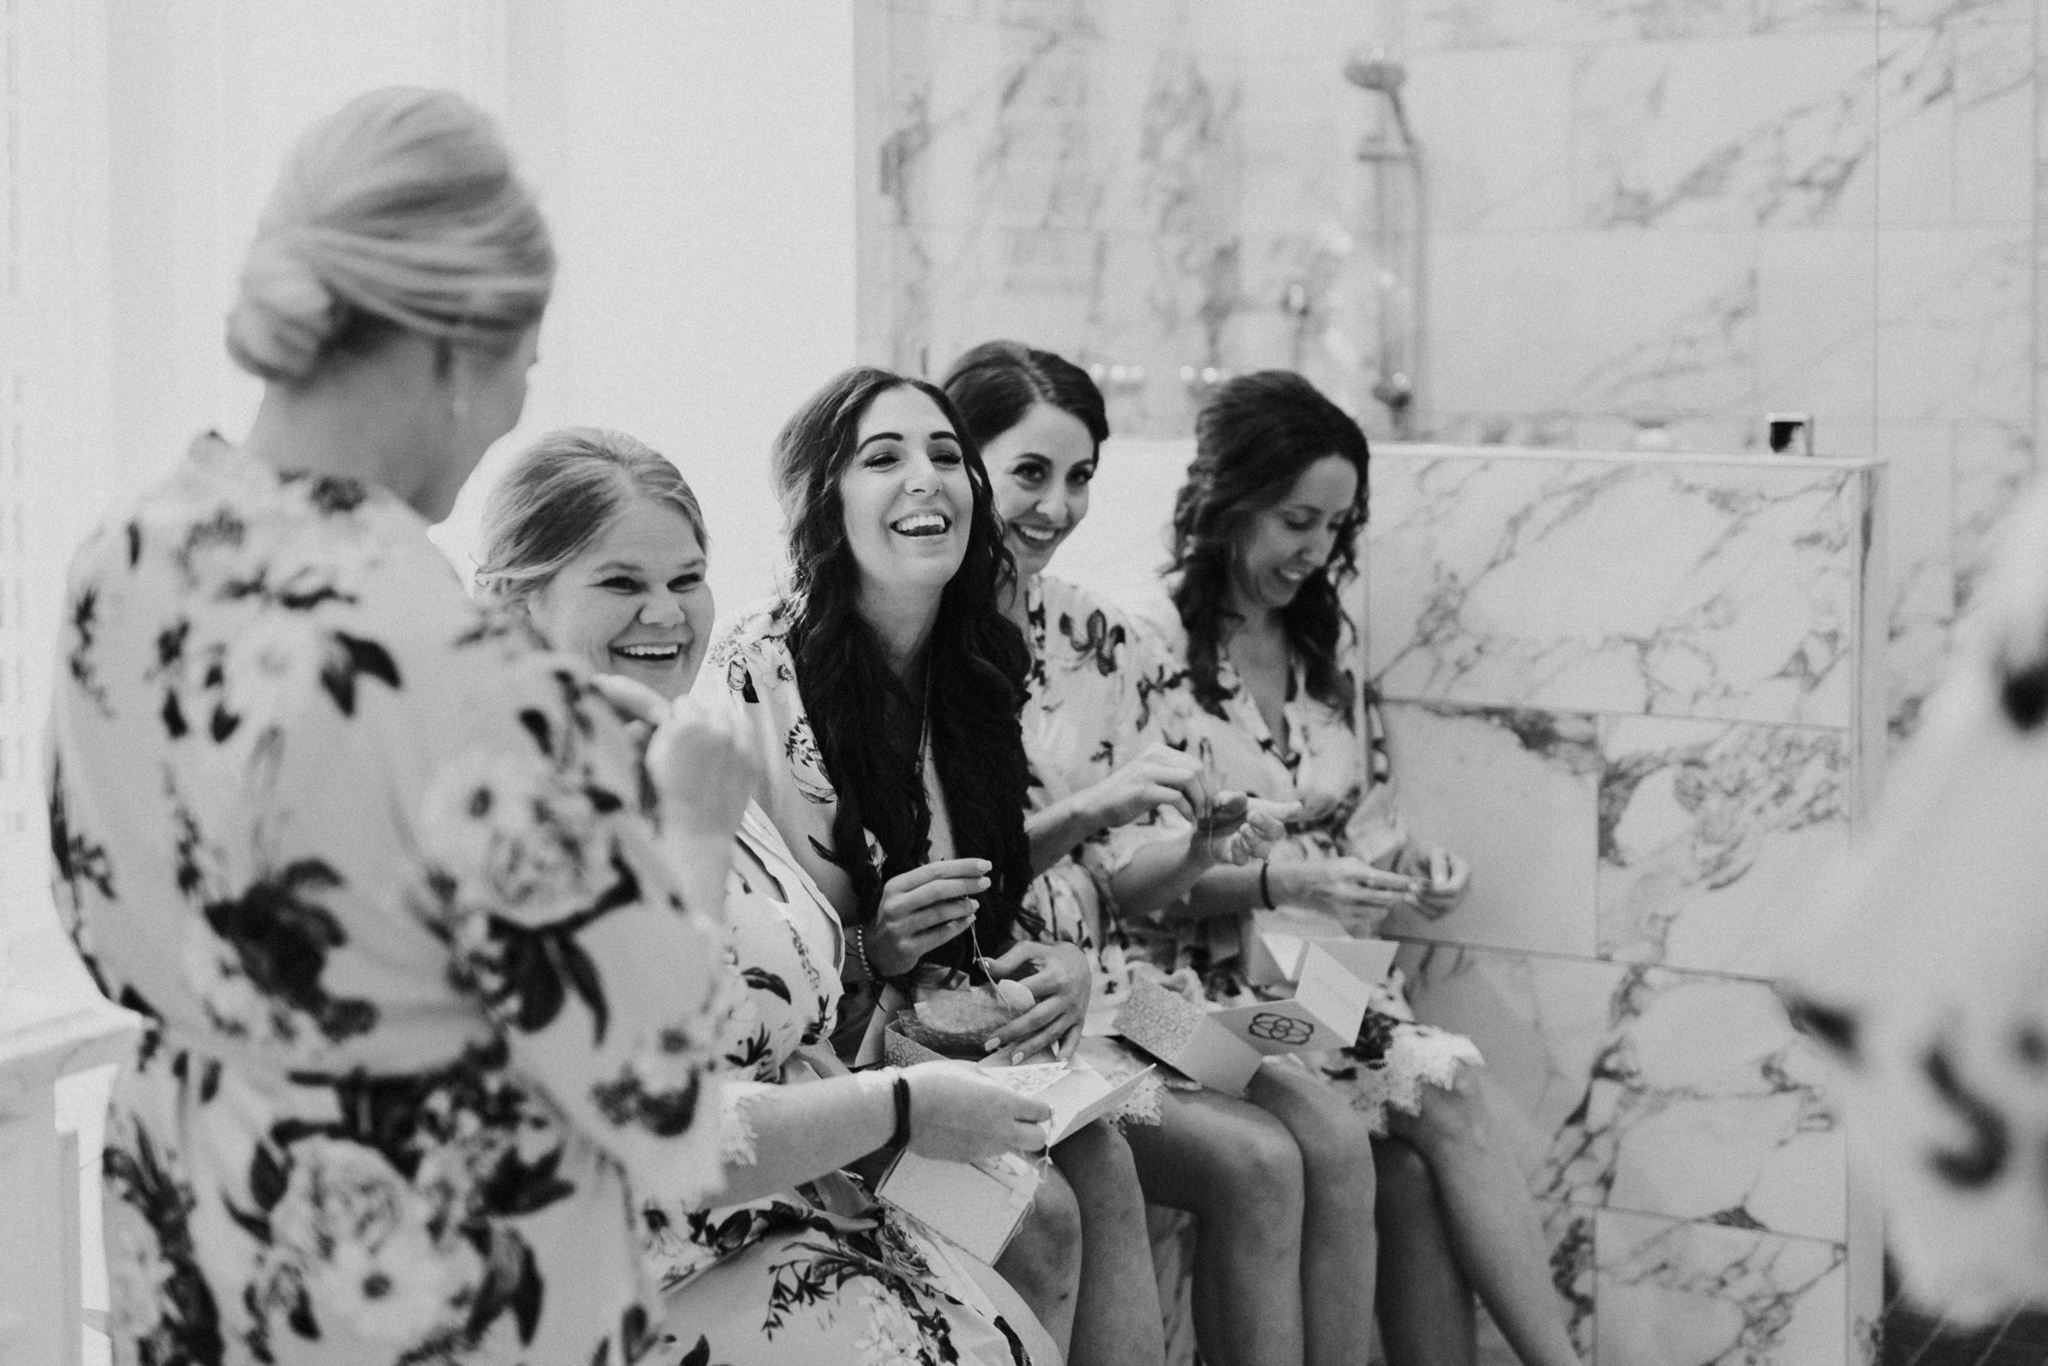 Houston Wedding Photographer-Intimate Texas Backyard Wedding- Houston Wedding Photographer -Kristen Giles Photography-11.jpg